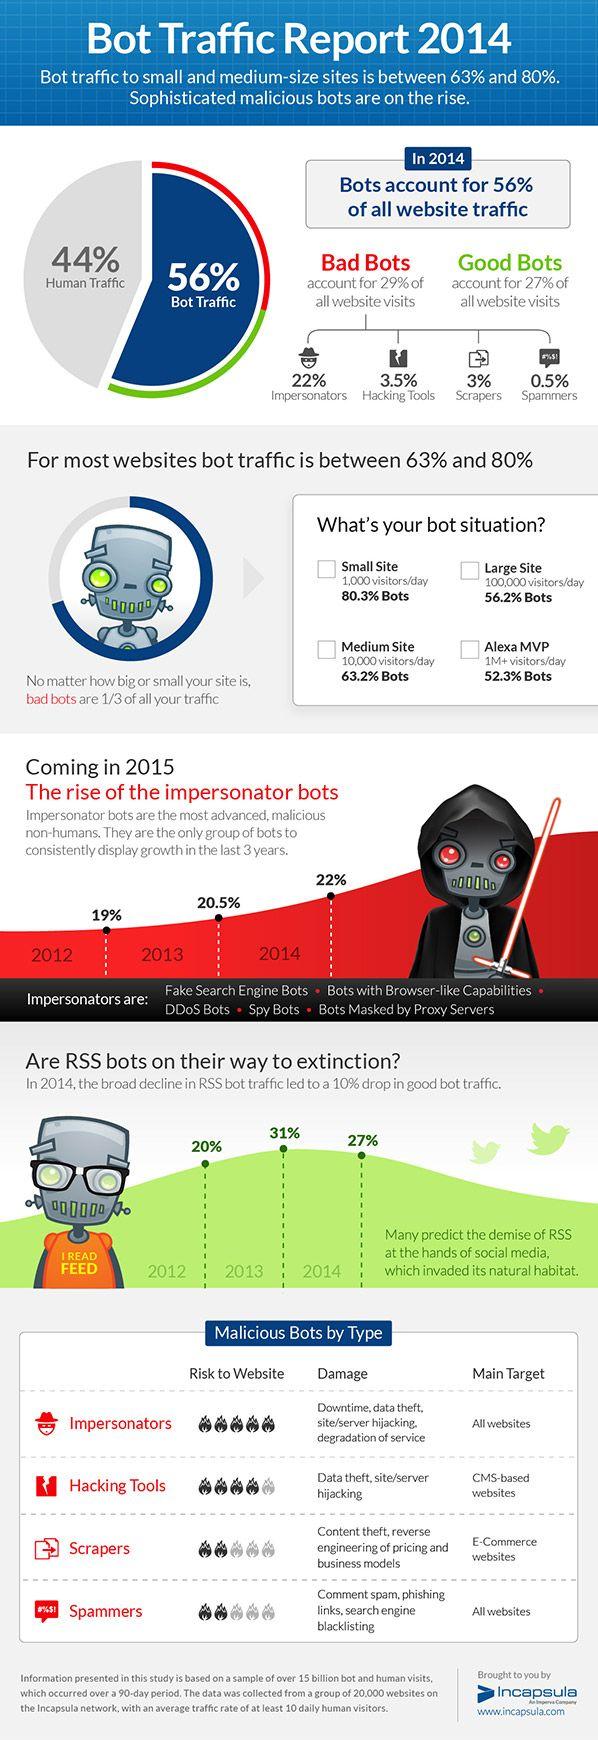 2014 Bot Traffic Report - Infographic